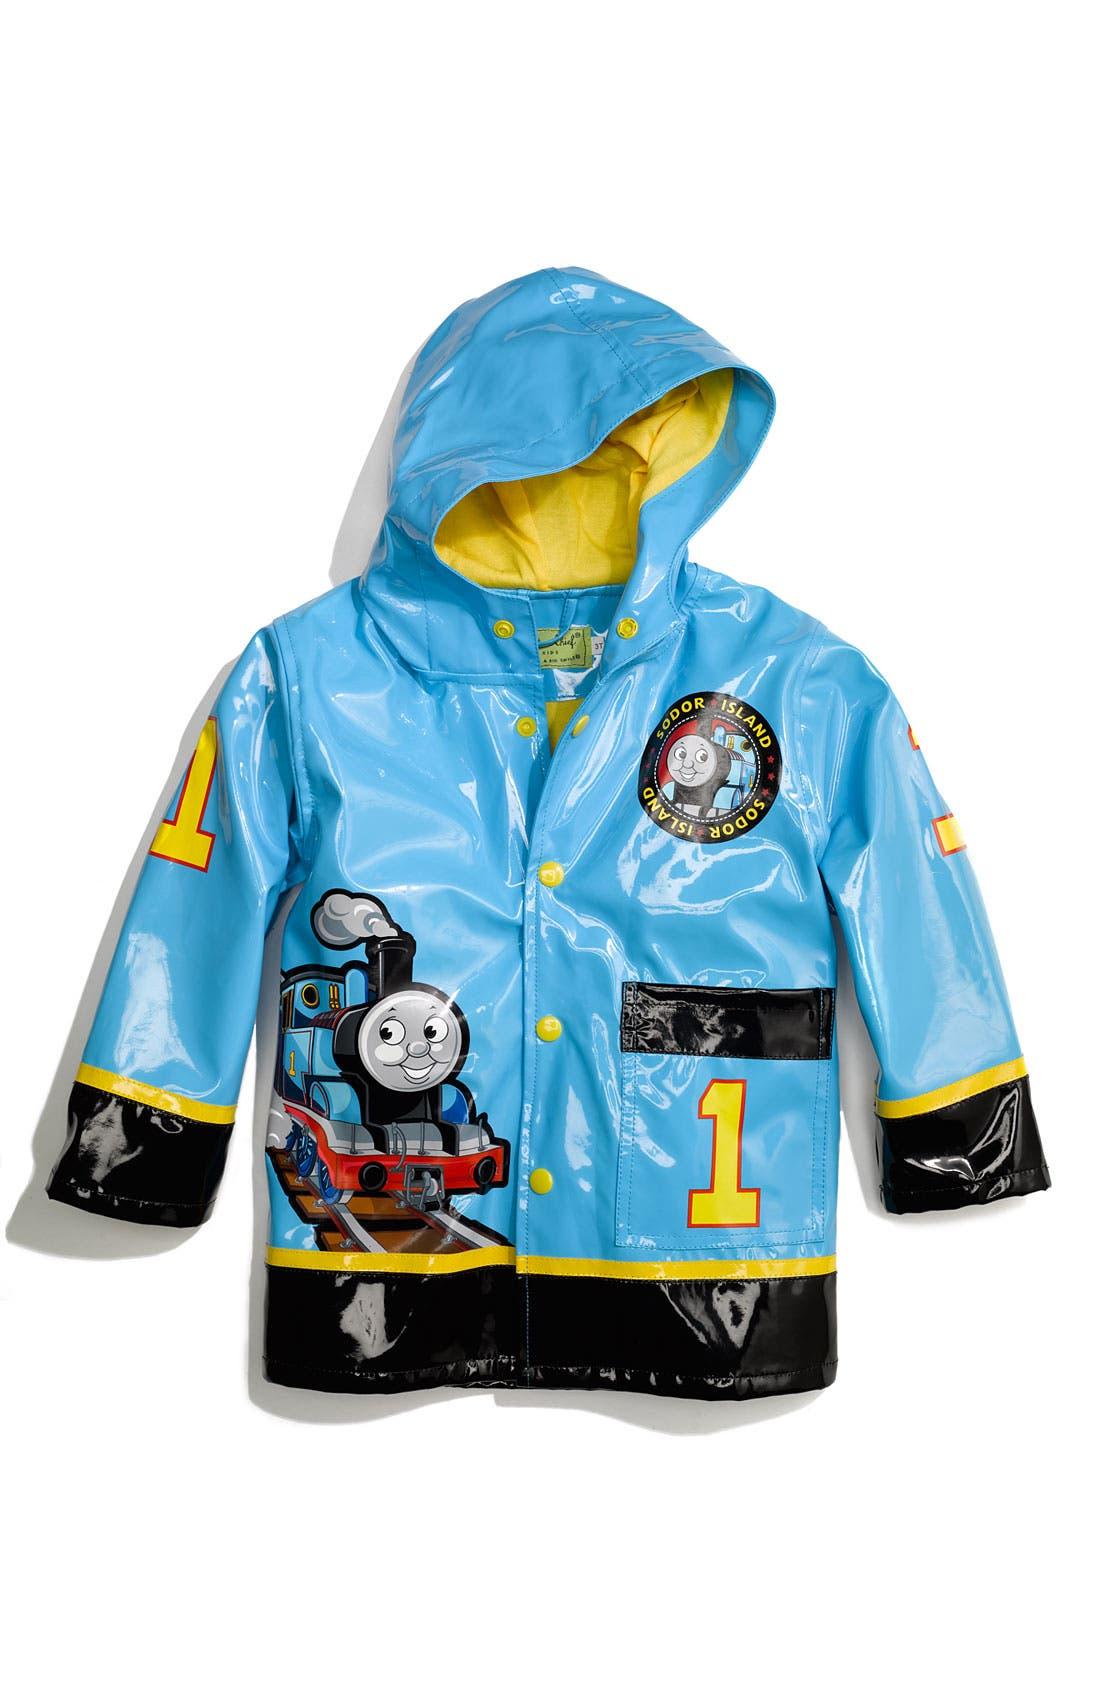 Alternate Image 1 Selected - Western Chief 'Thomas the Tank Engine®' Raincoat (Toddler Boys & Little Boys)